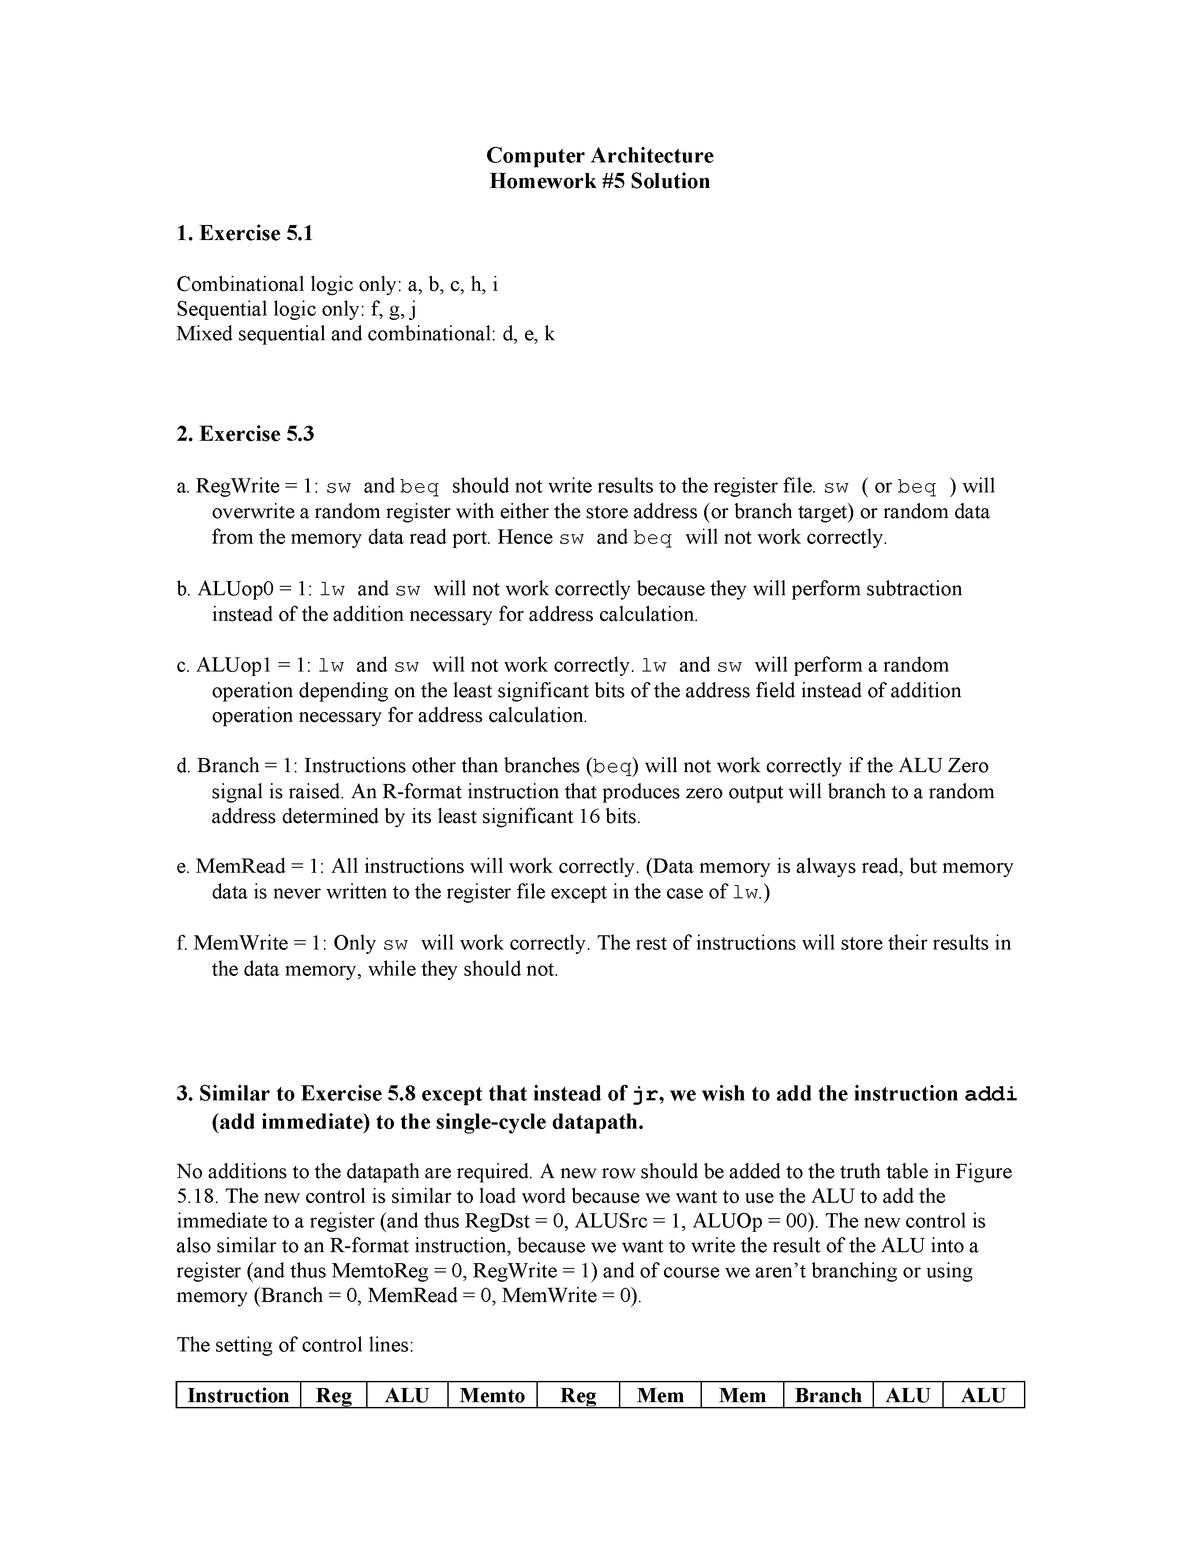 451 hw5 solution - CIS 451: Computer Architecture - StuDocu